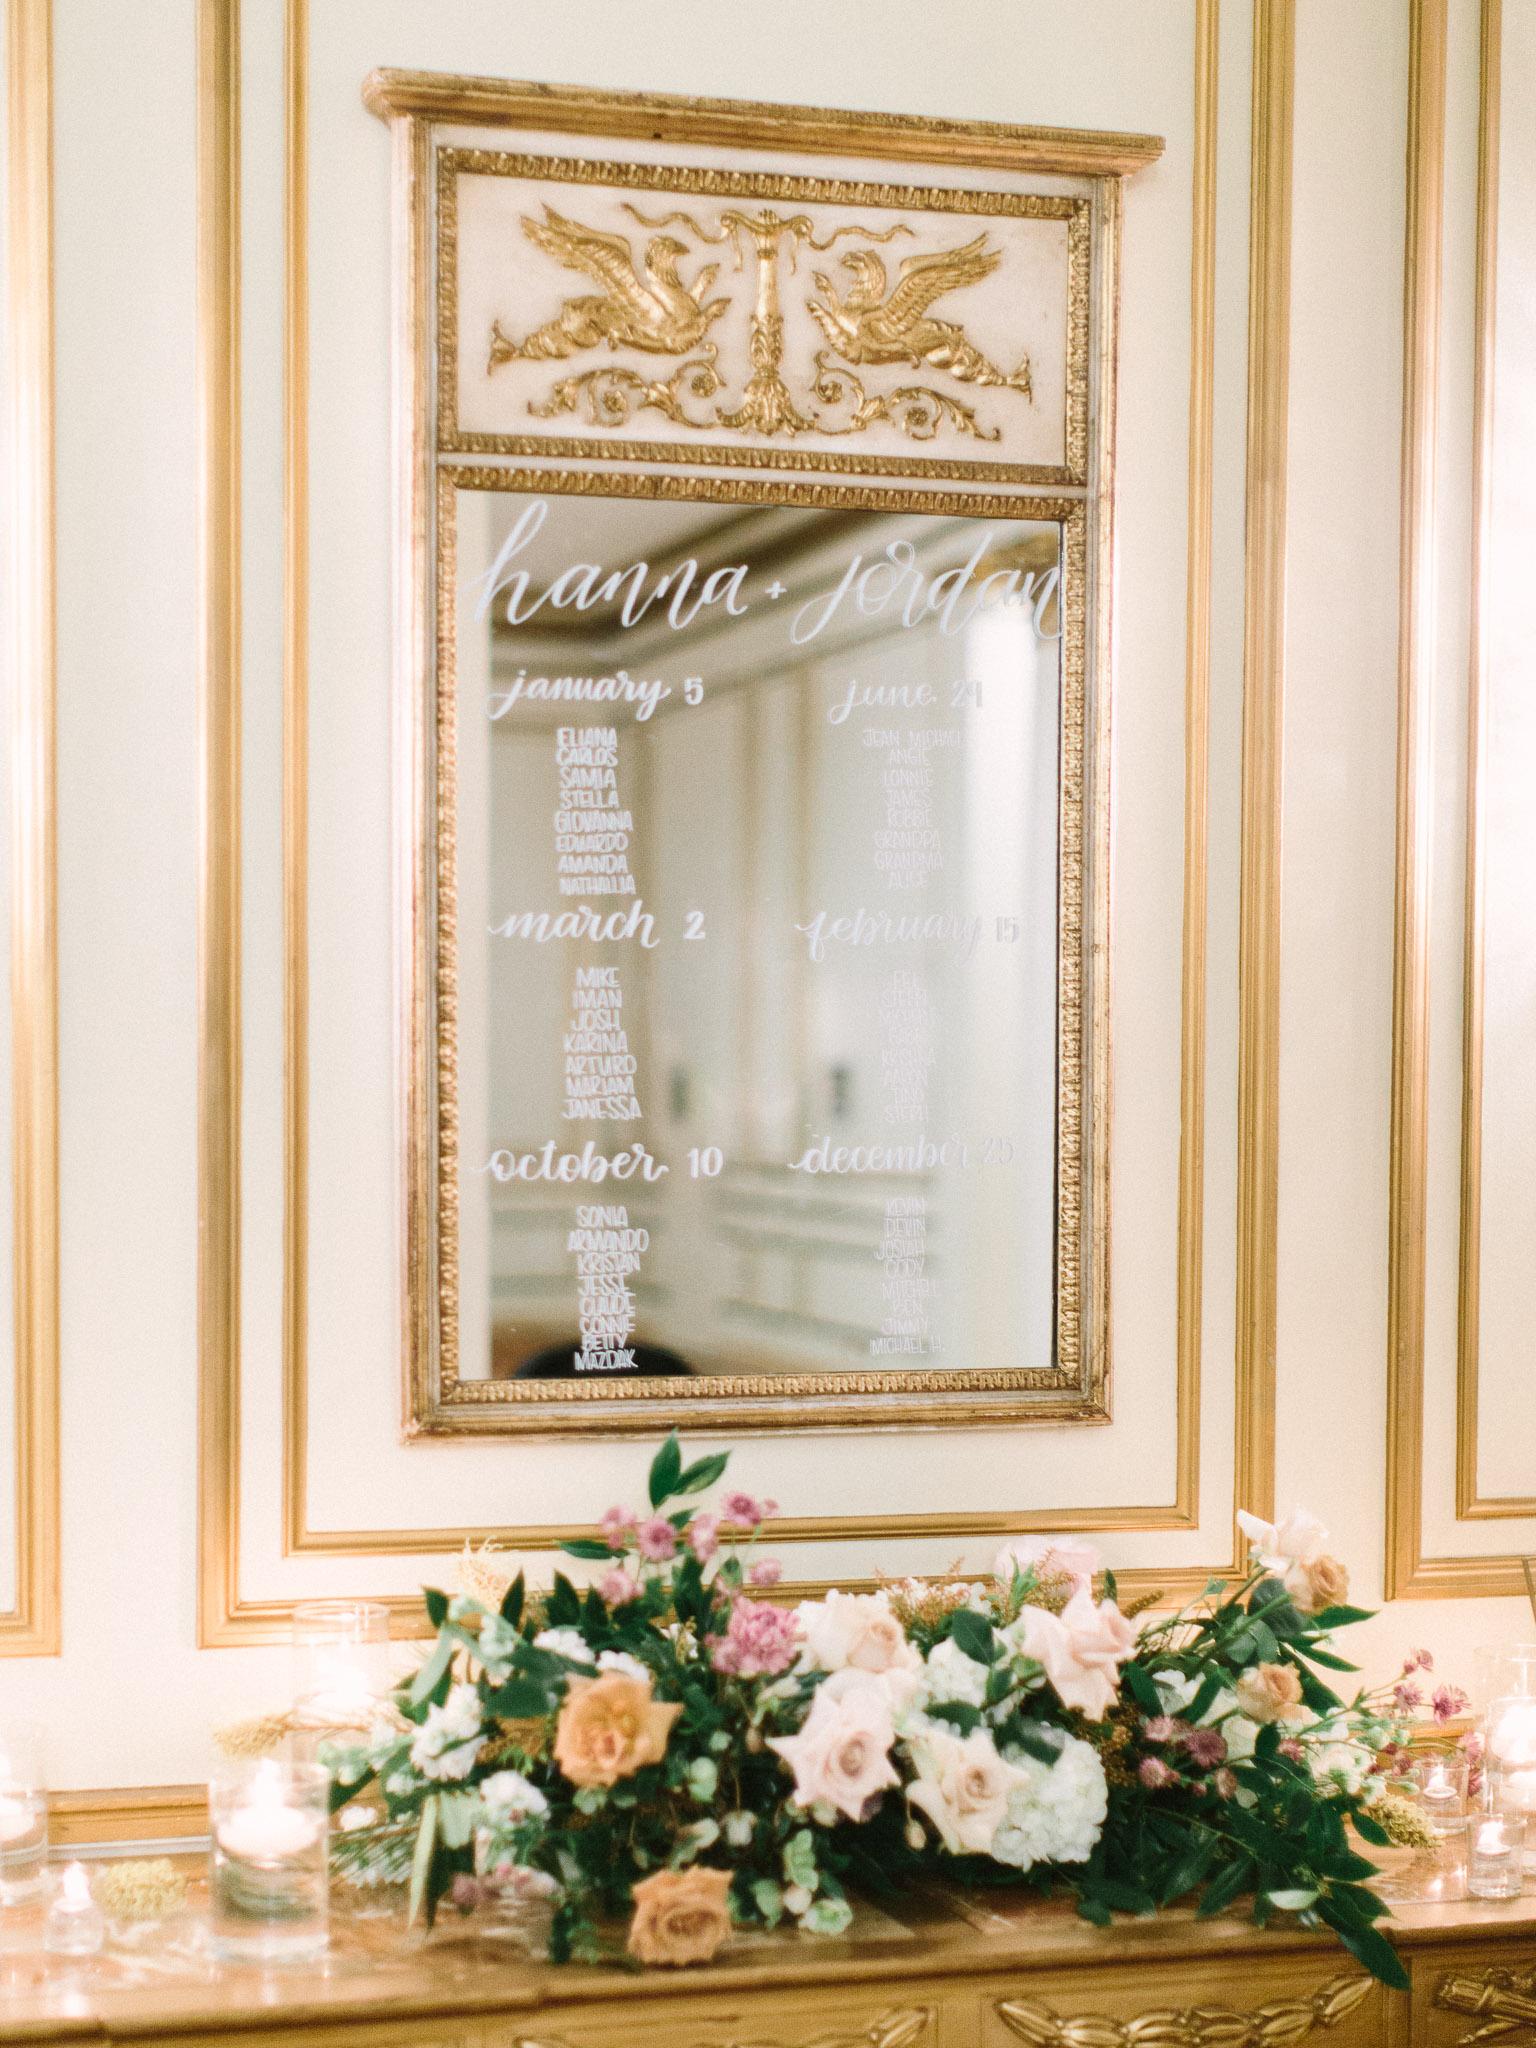 Hanna&Jordan Wedding_HotelVancouver_9251.jpg